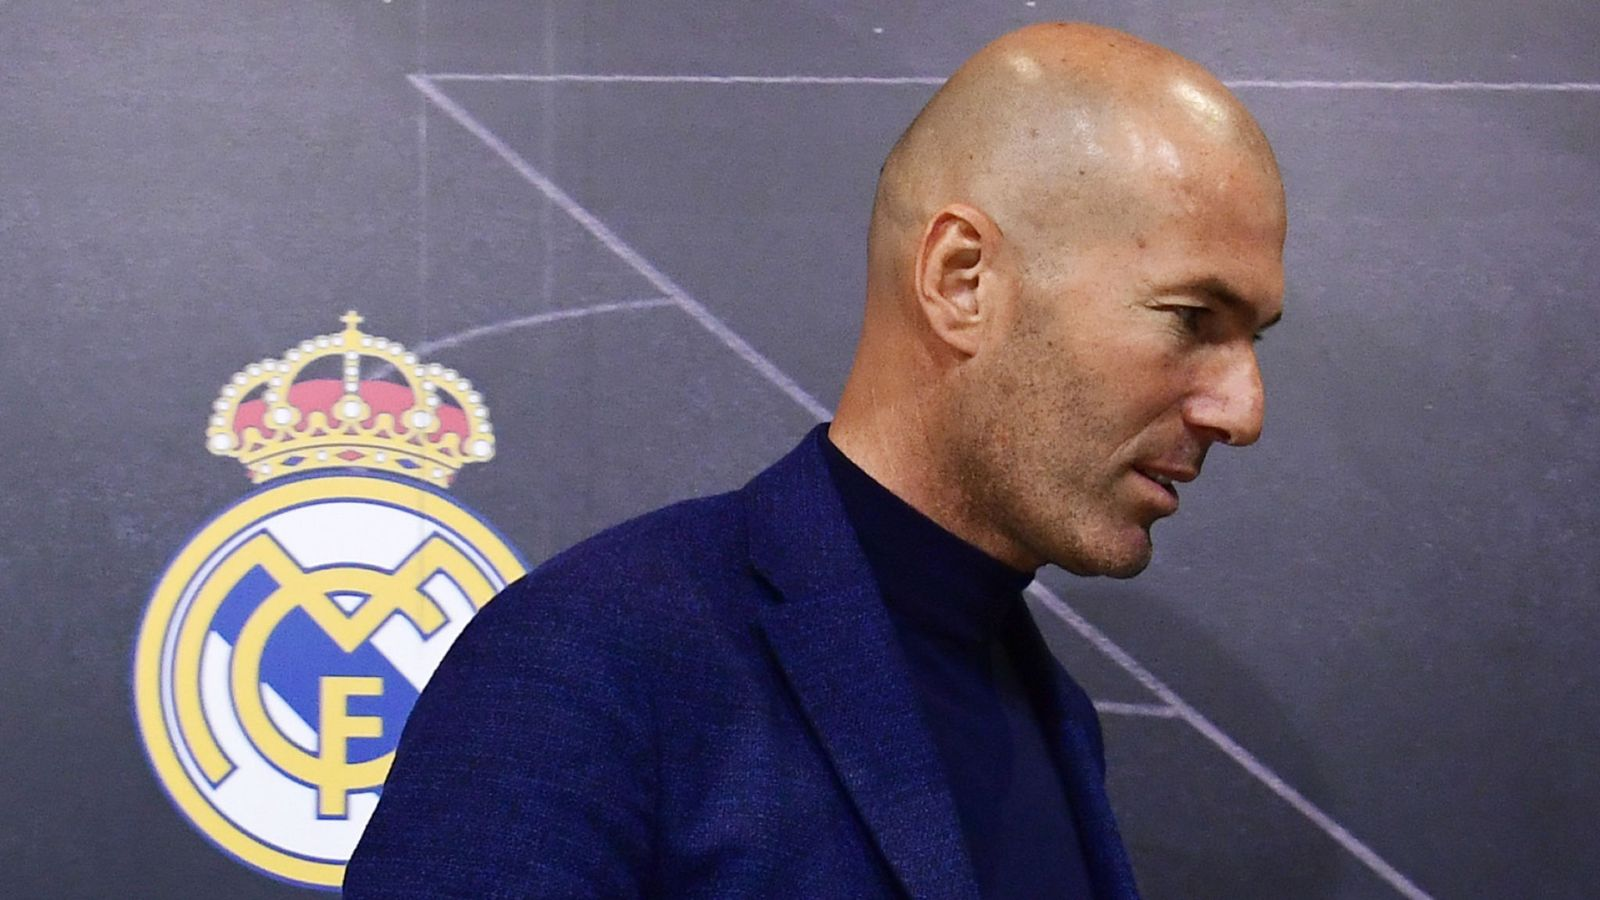 real madrid's transfer plan on hold due to COVID-19 - Bóng Đá